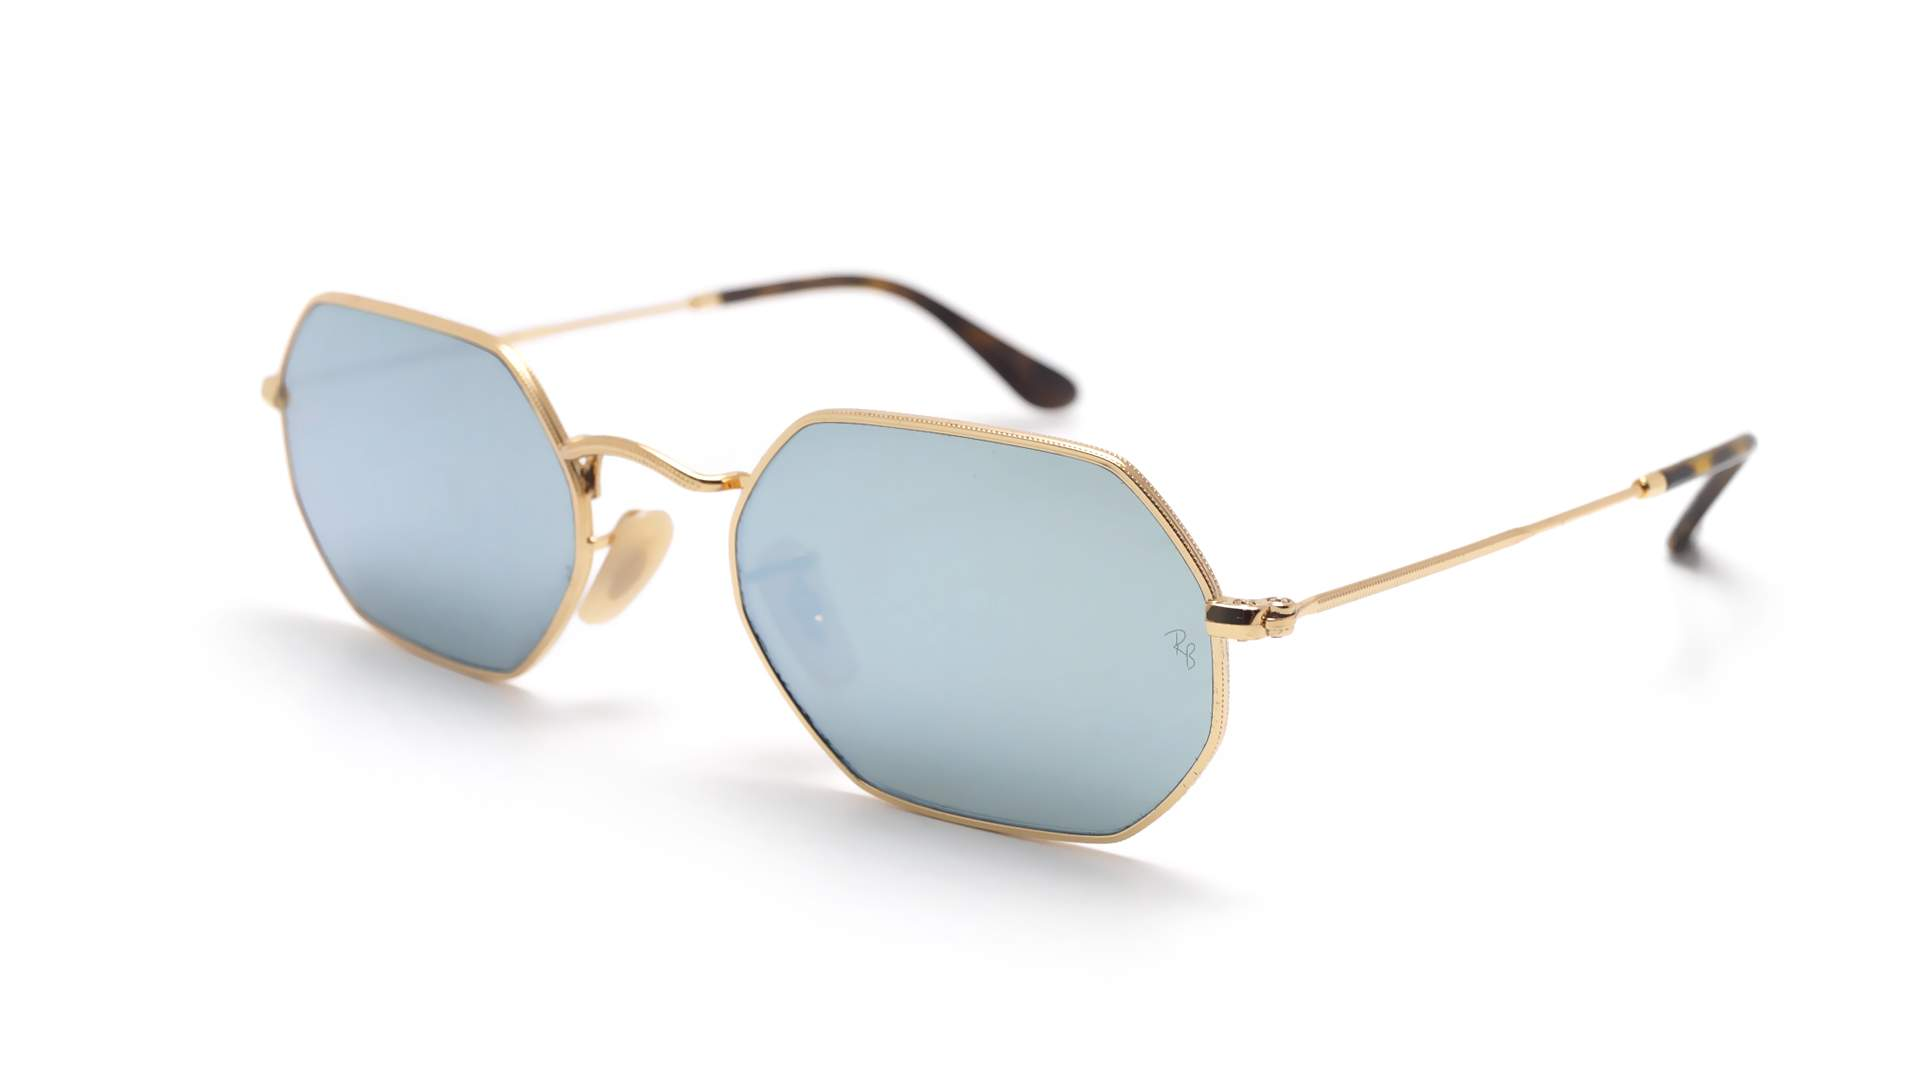 fd02cc2301 Sunglasses Ray-Ban Octagonal Gold RB3556N 001 30 53-21 Medium Mirror